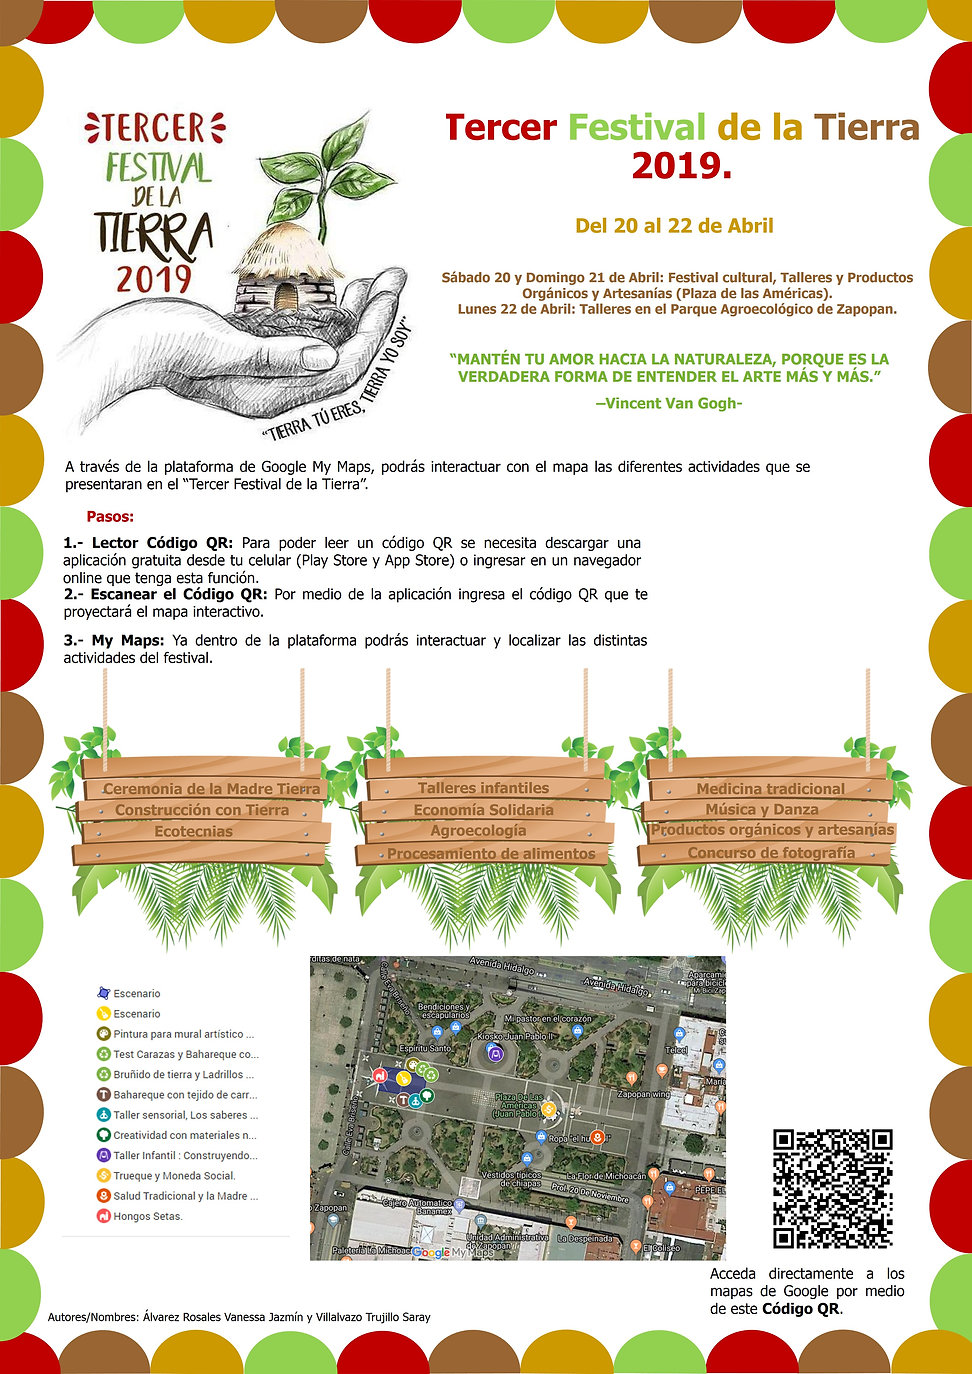 Mapainteractivo3FestivalTierra.jpg